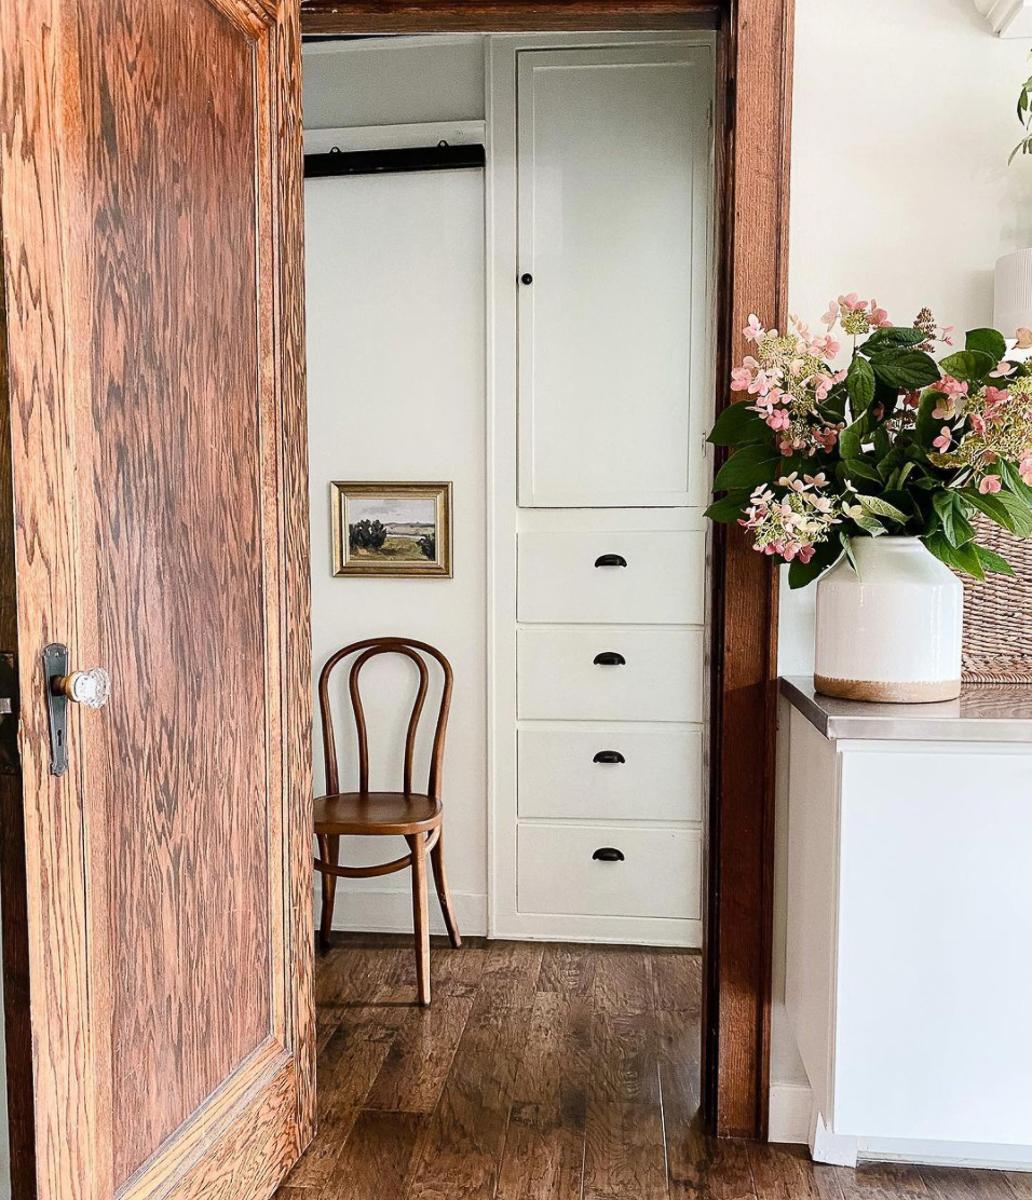 Original linen closet in this old home kellyelko.com